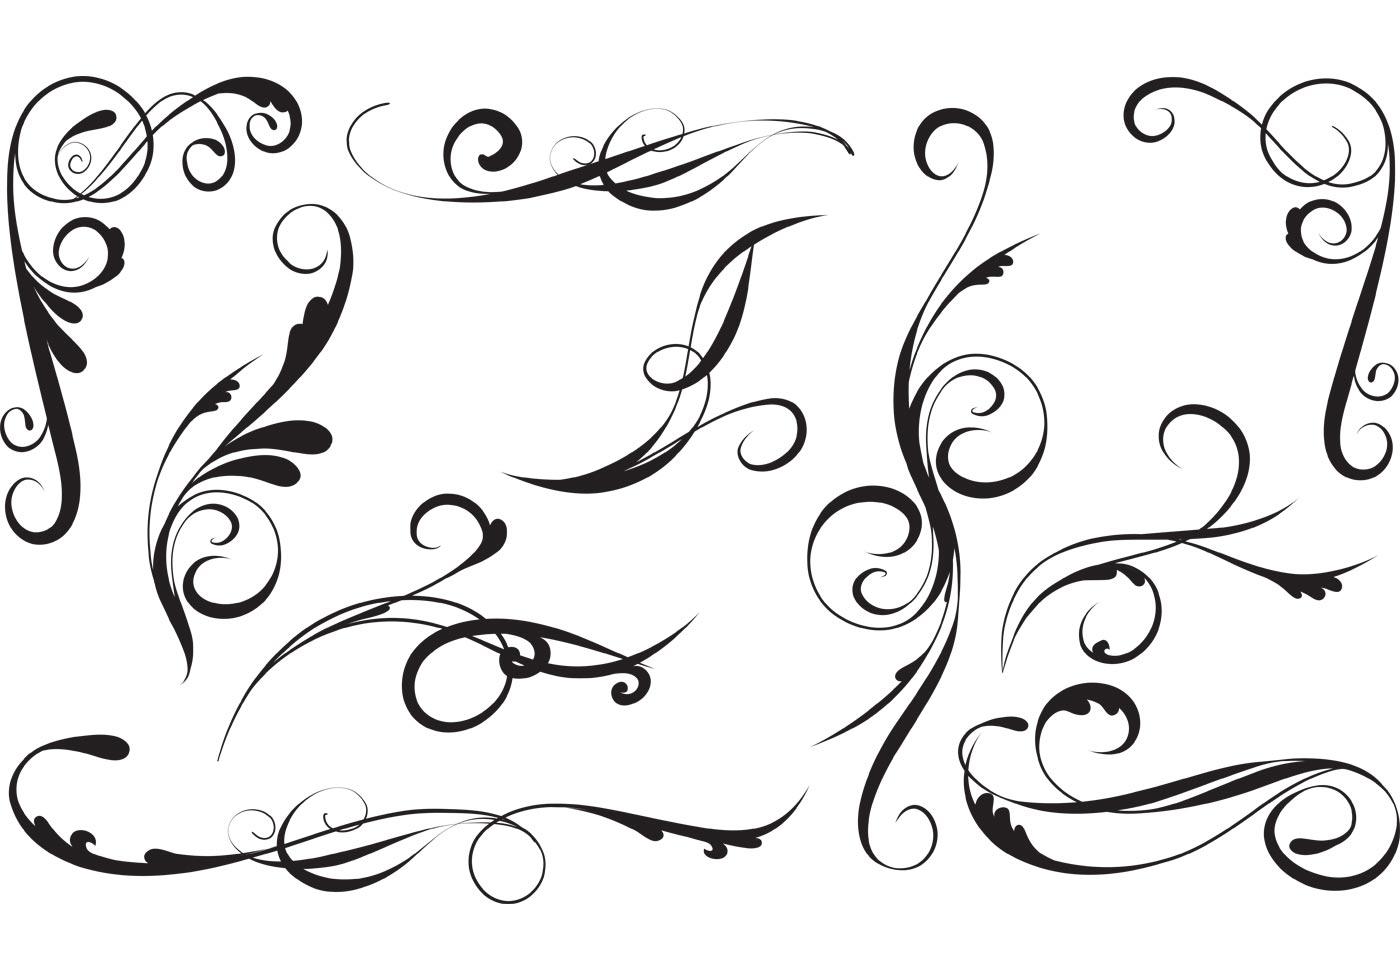 11 Elegant Swirl Designs Vector Images